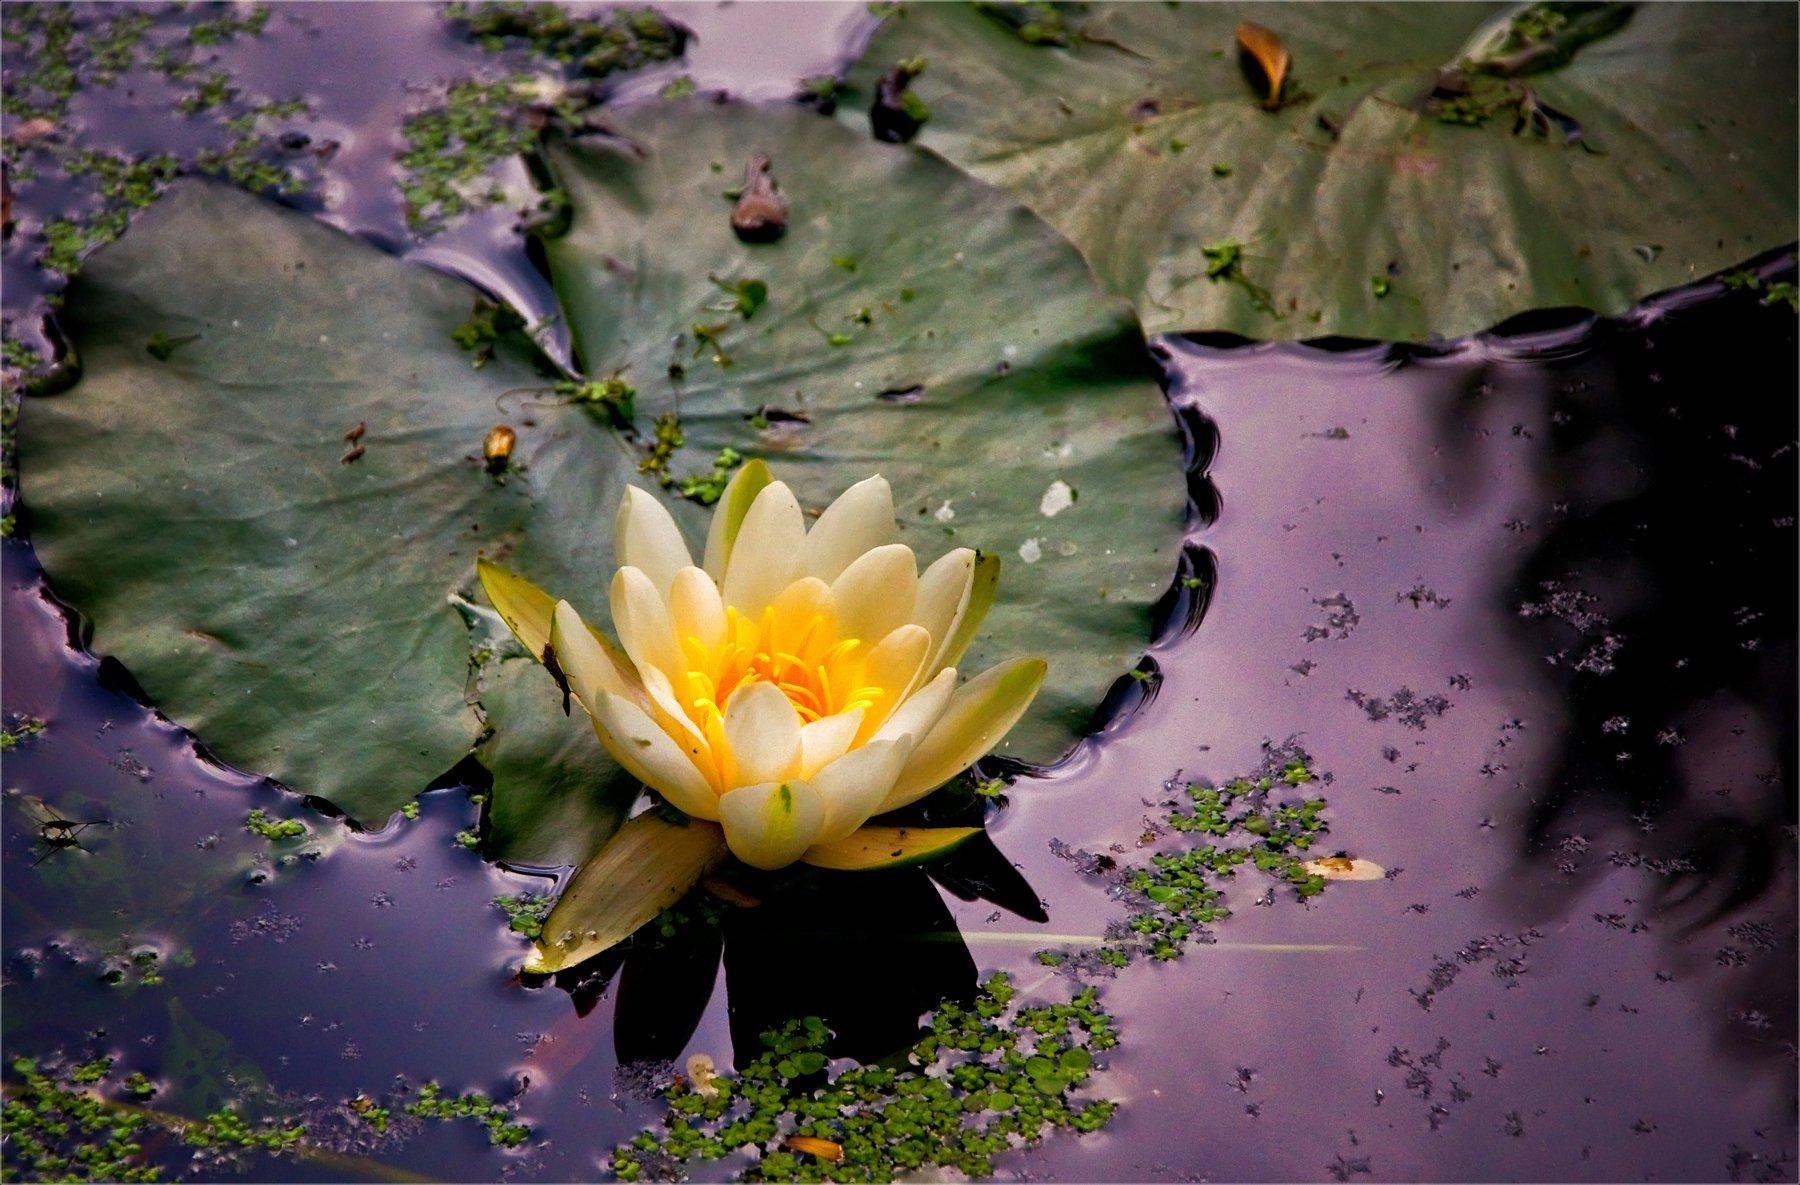 nature, природа,  растение, листья, макро, цветы,  весна, лето,  красота,  зеленый,цветок, кувшинка, лепестки, вода, пруд, озеро, река, Михаил MSH